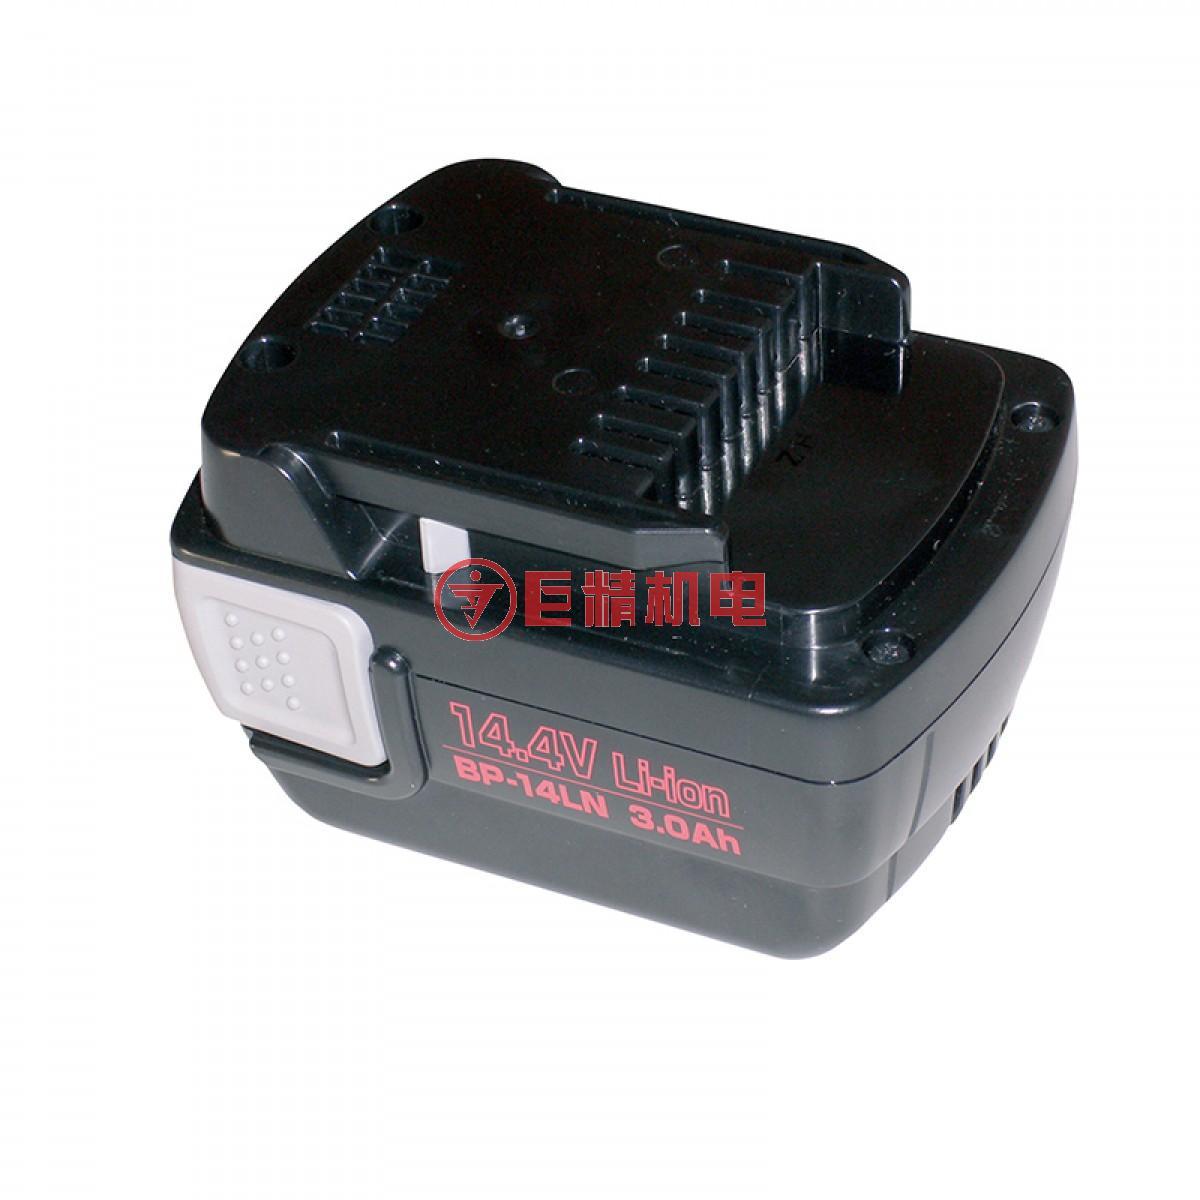 IZUMI BP-14LN 锂电池(配LIC产品) 设计专用于所有LC系列工具